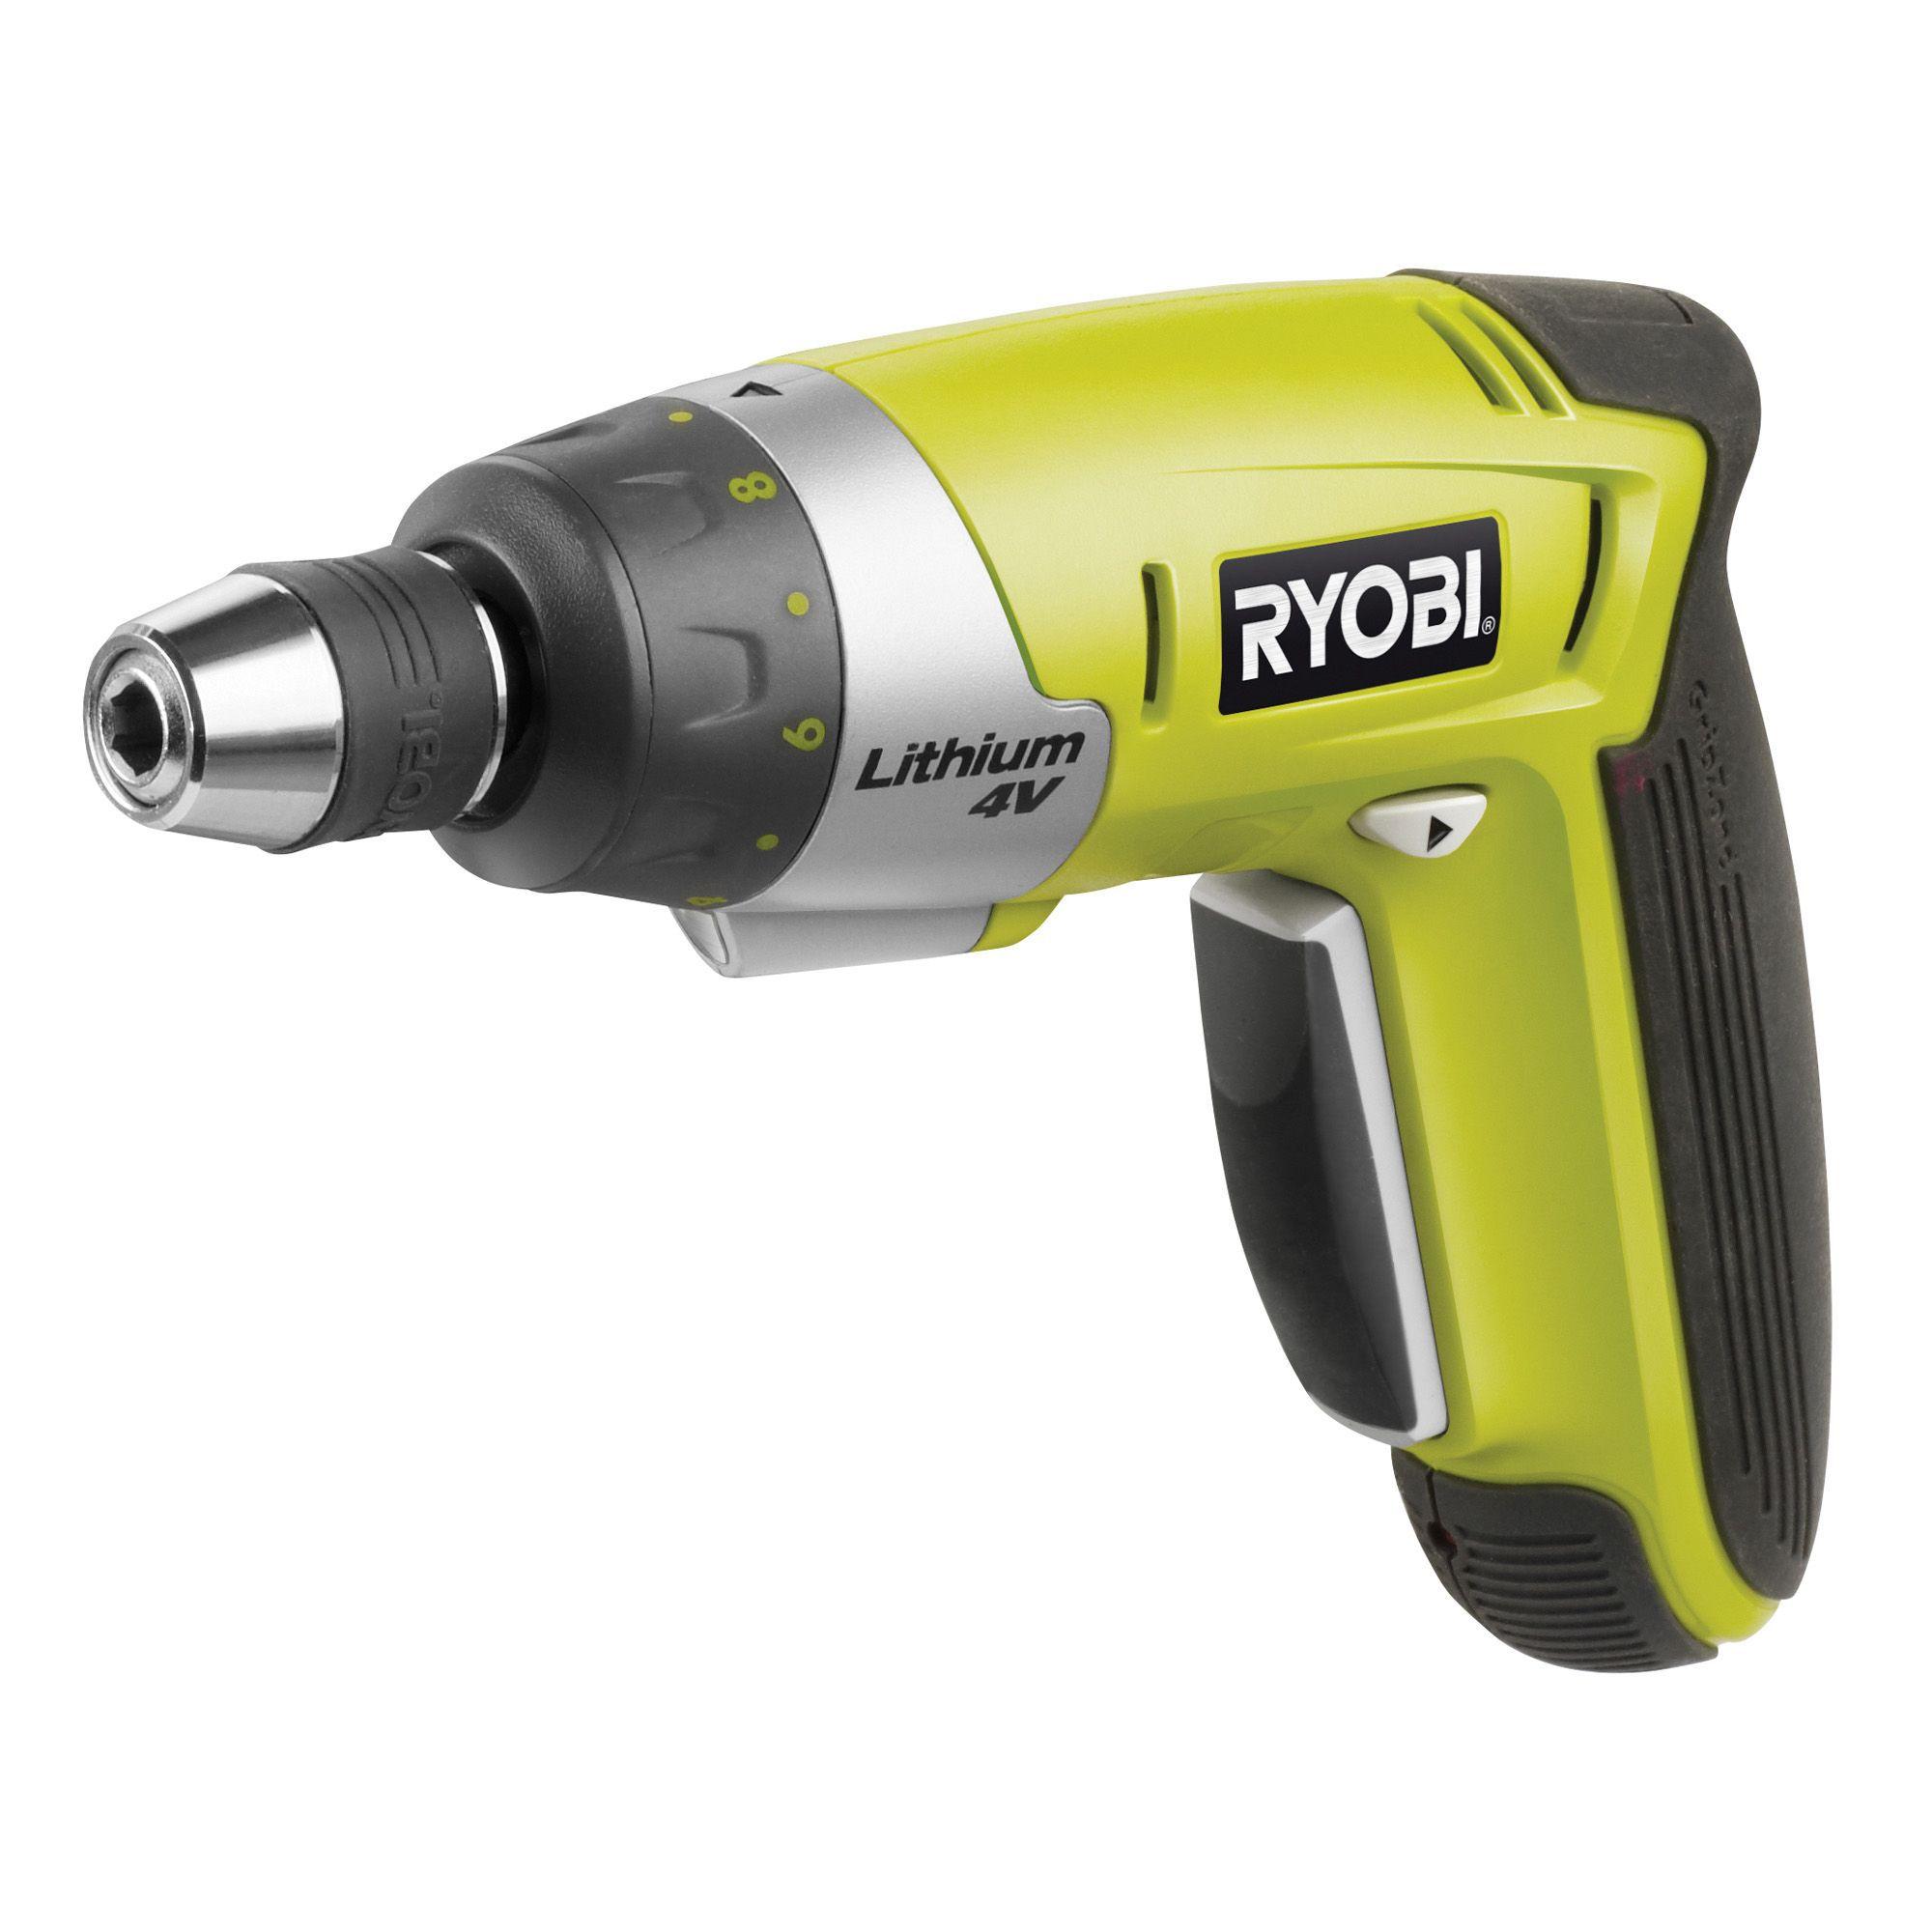 Ryobi 4v Li Ion Cordless Screwdriver Csd4107bg